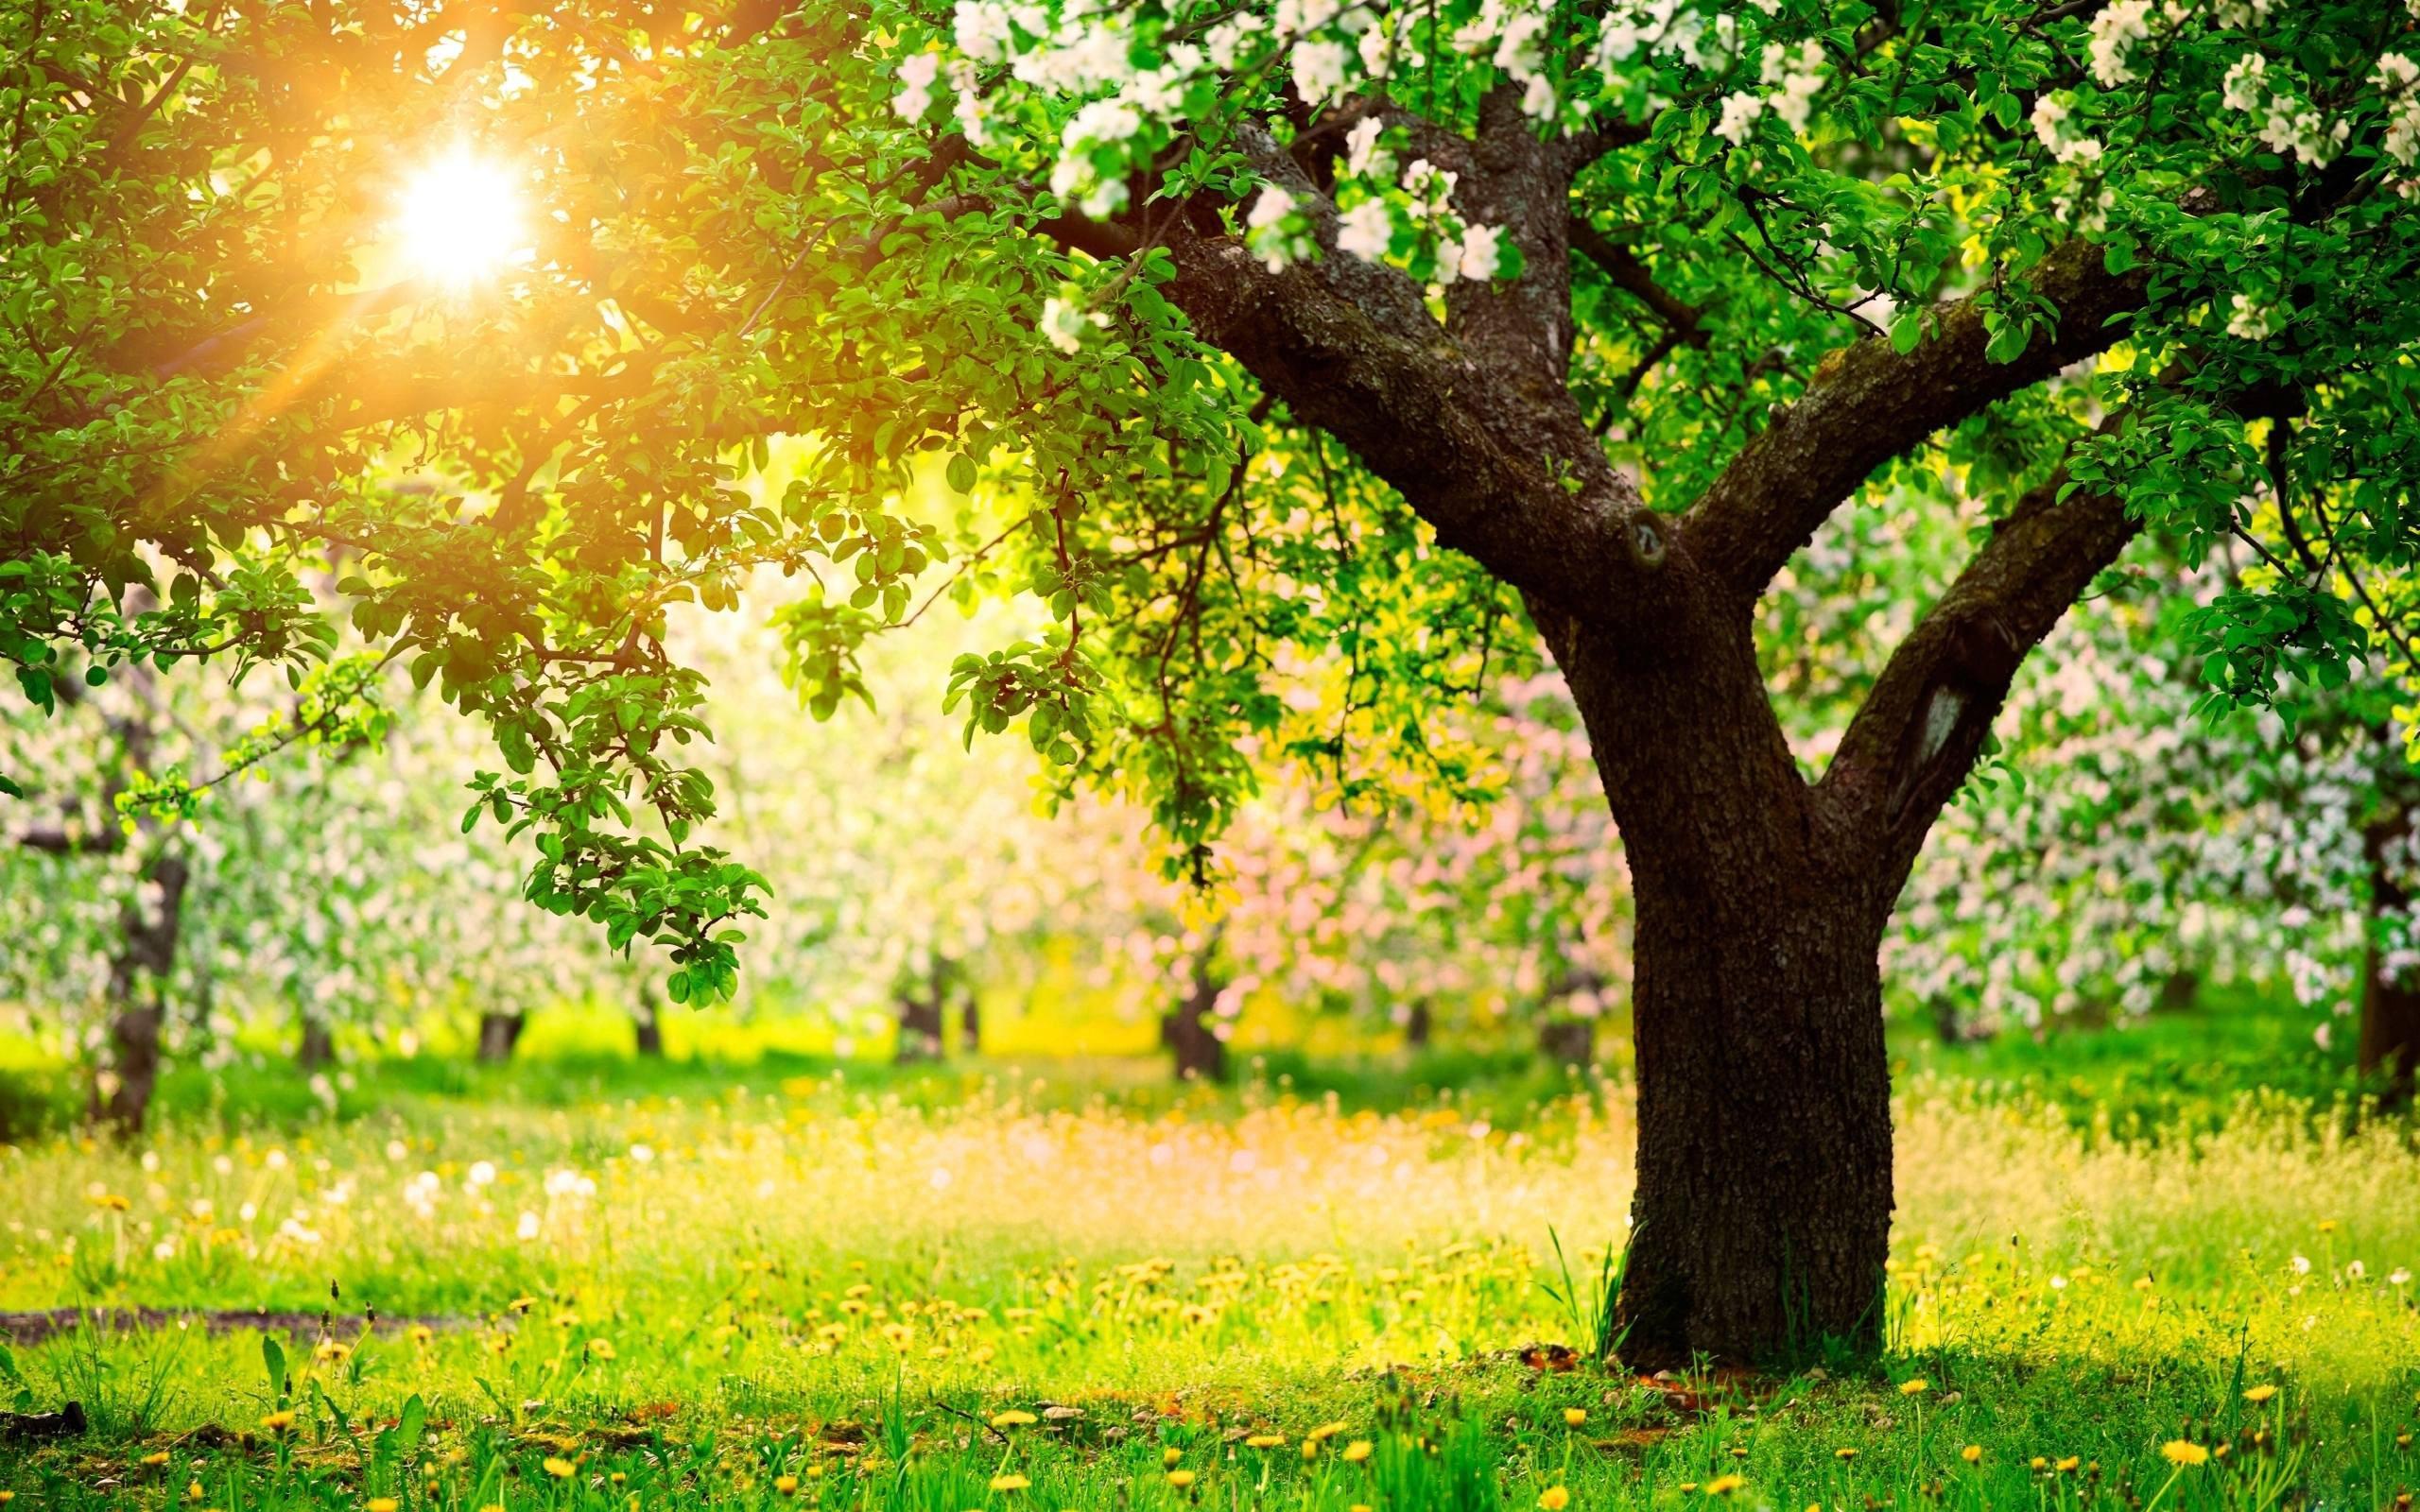 Beautiful Spring Nature Desktop Wallpapers   New HD Wallpapers 2560x1600